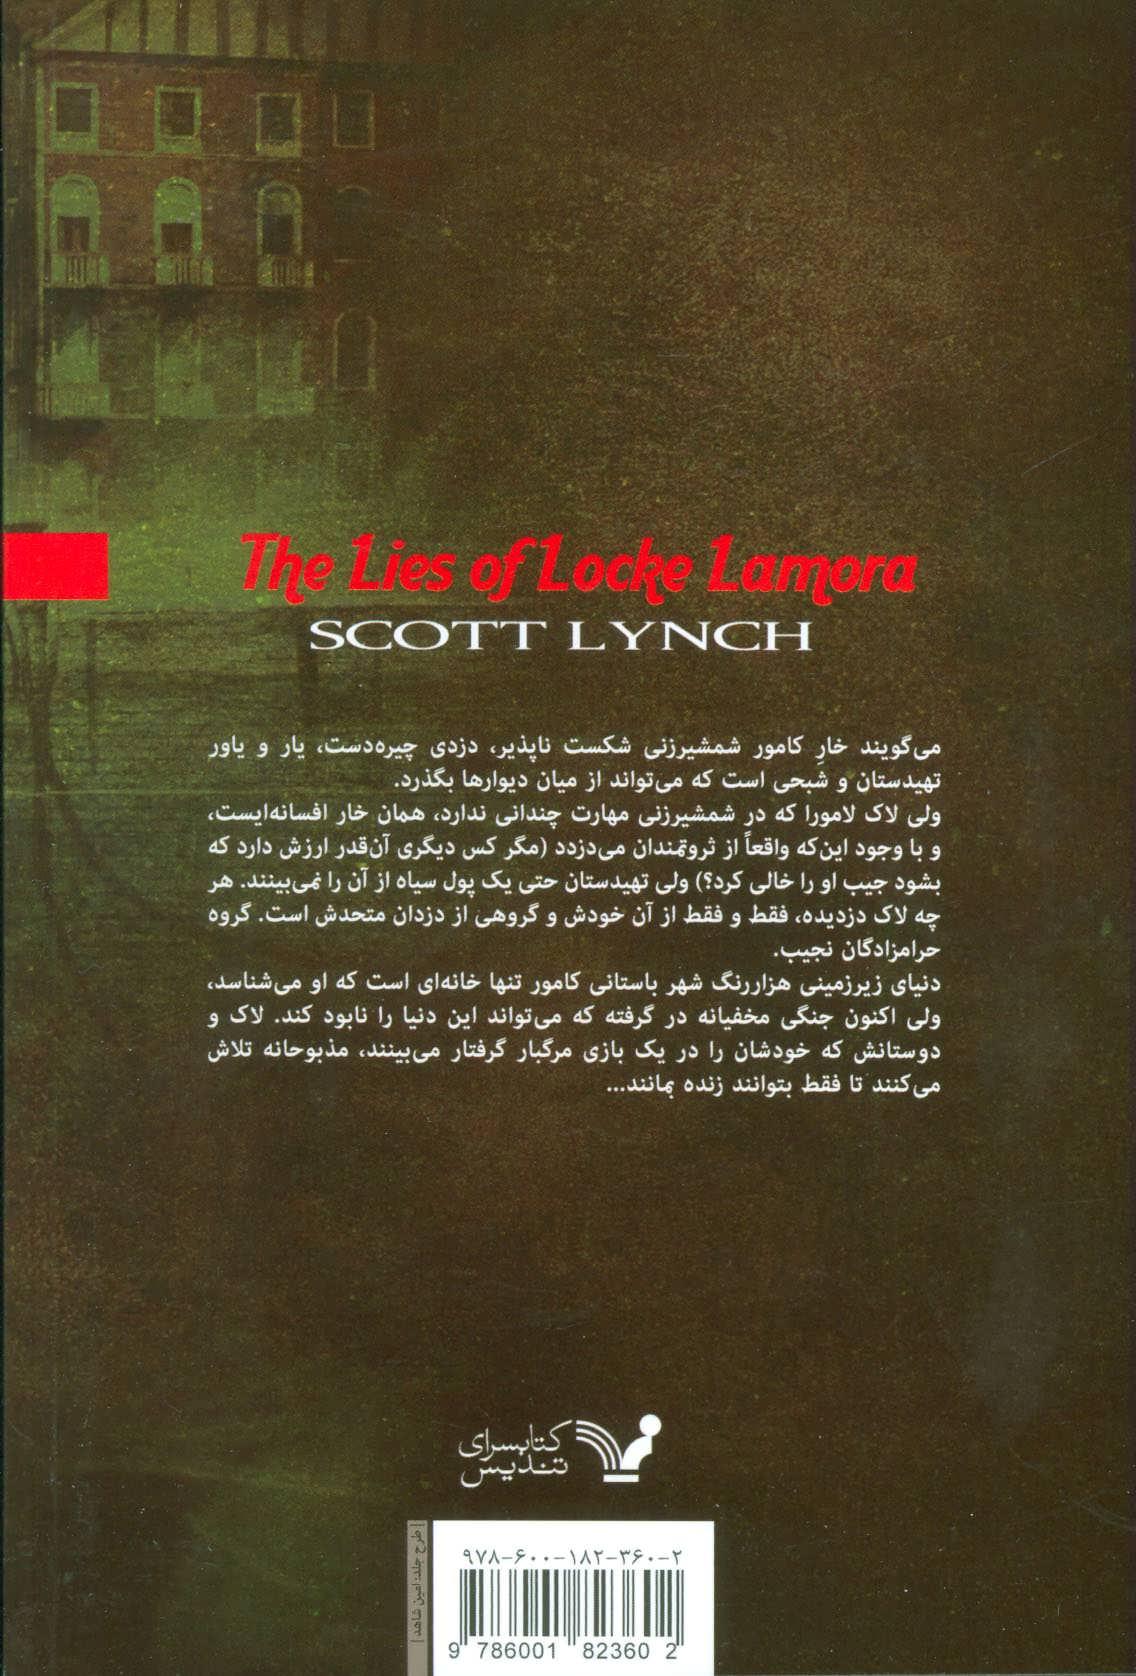 دروغ های لاک لامورا (ماجراهای لاک لامورا 1)